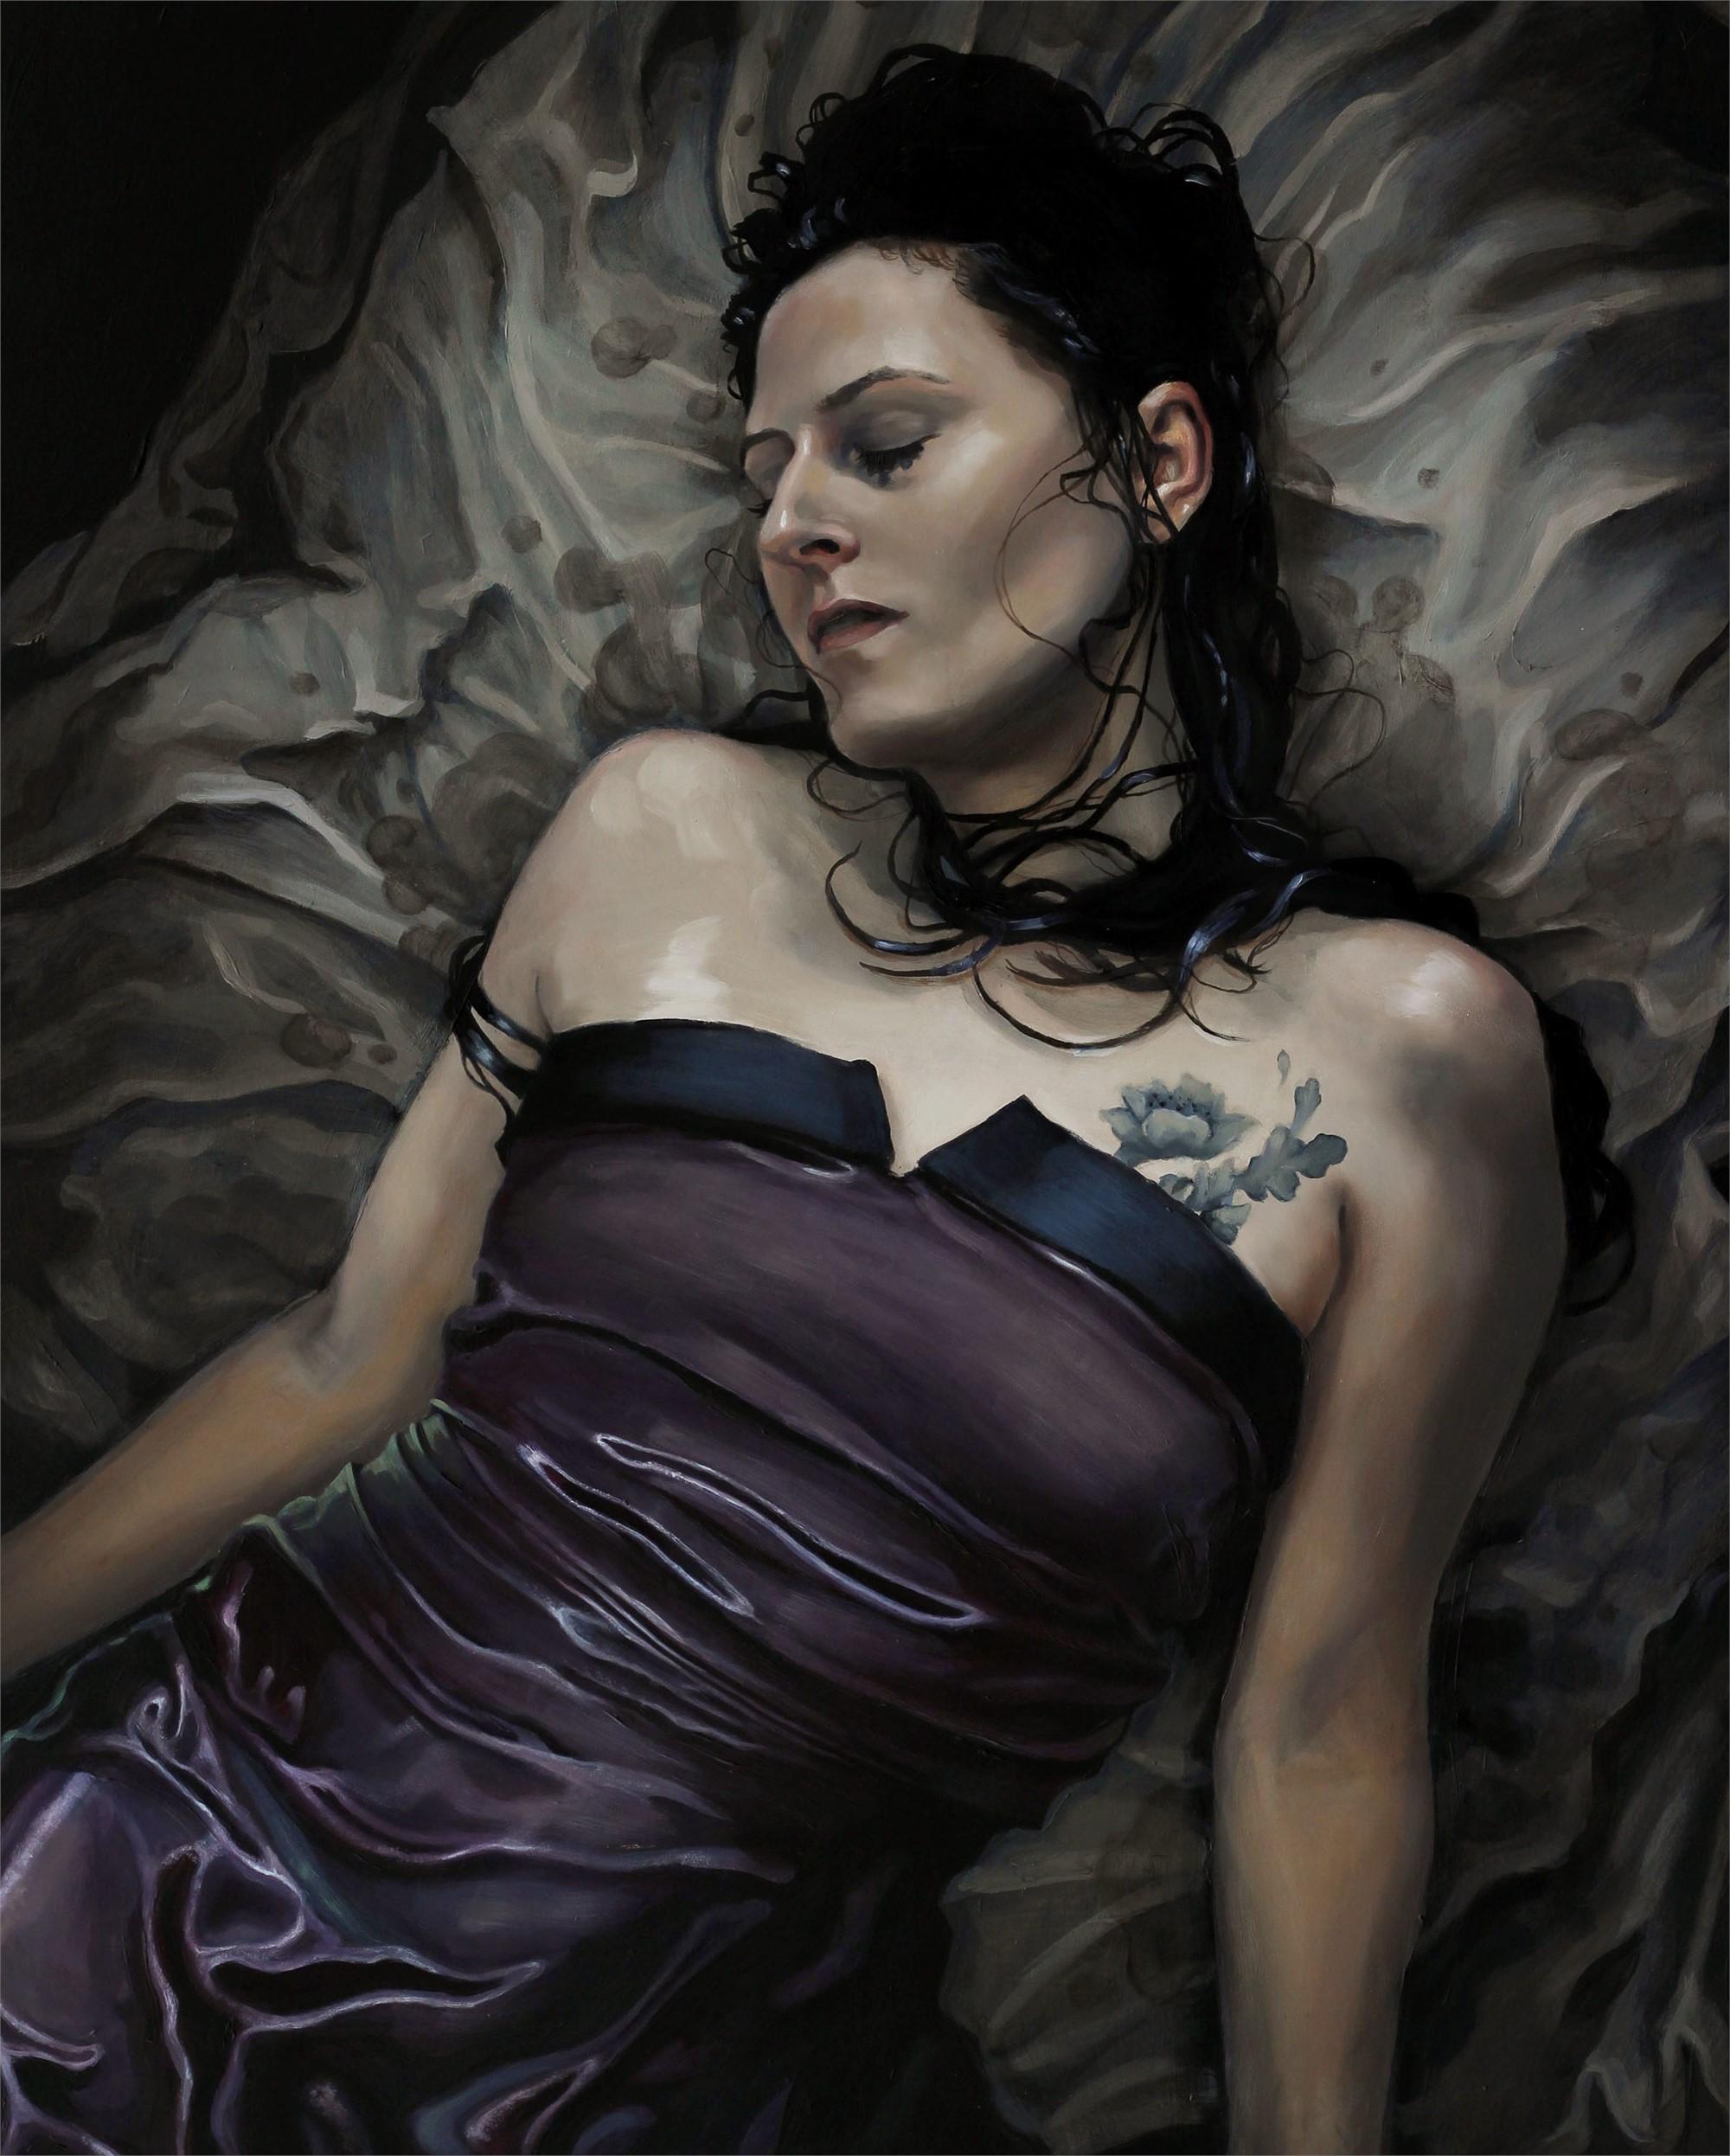 Ophelia by Mary Chiaramonte